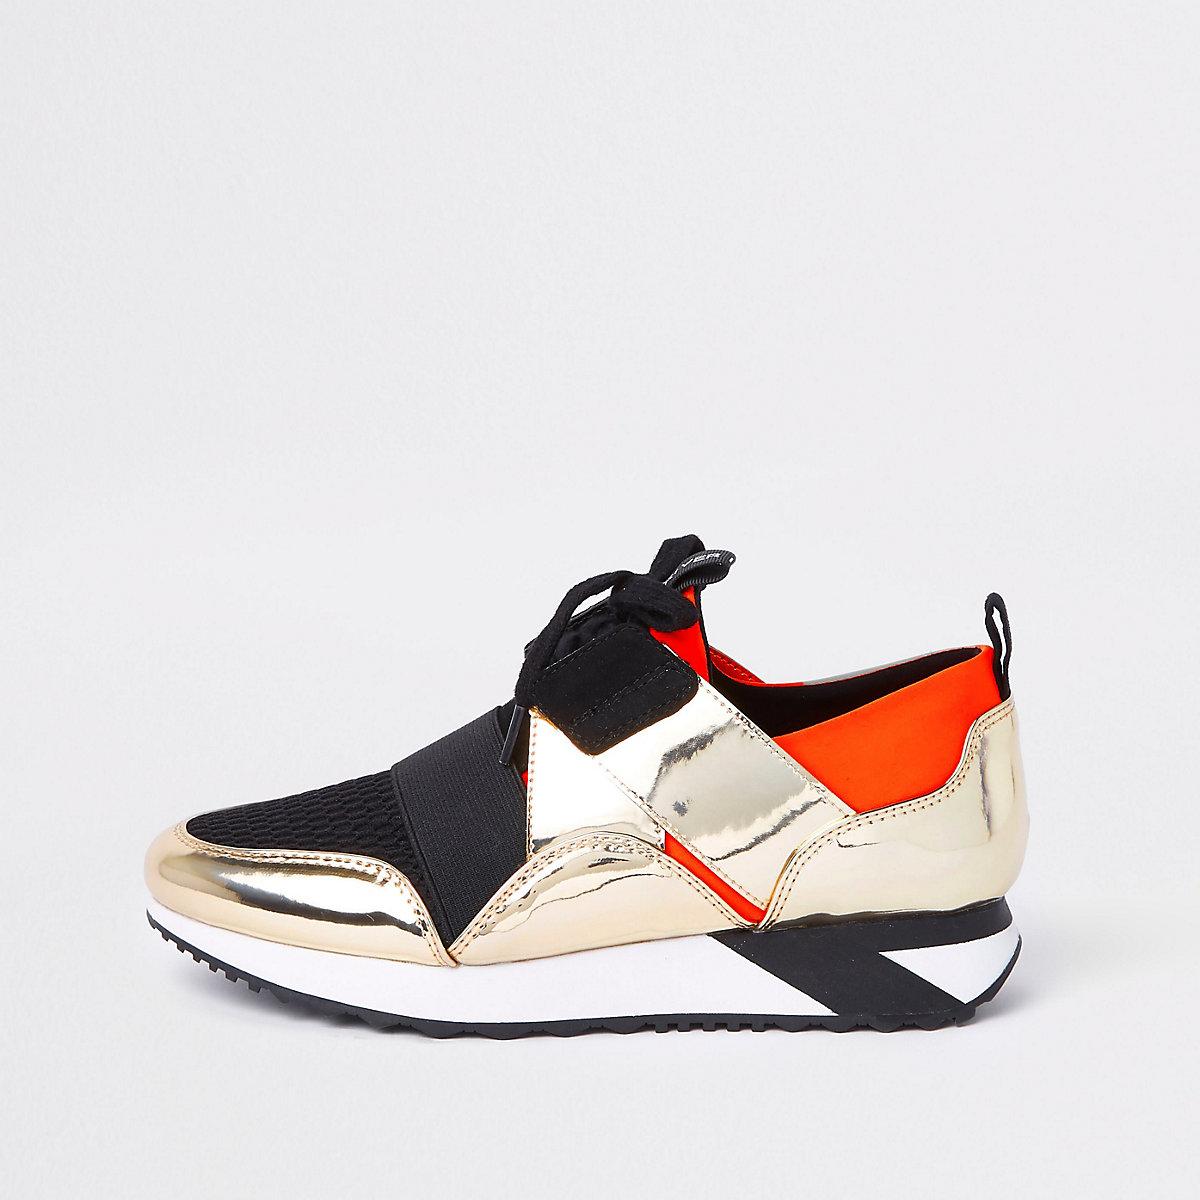 Orange elastic lace-up runner sneakers